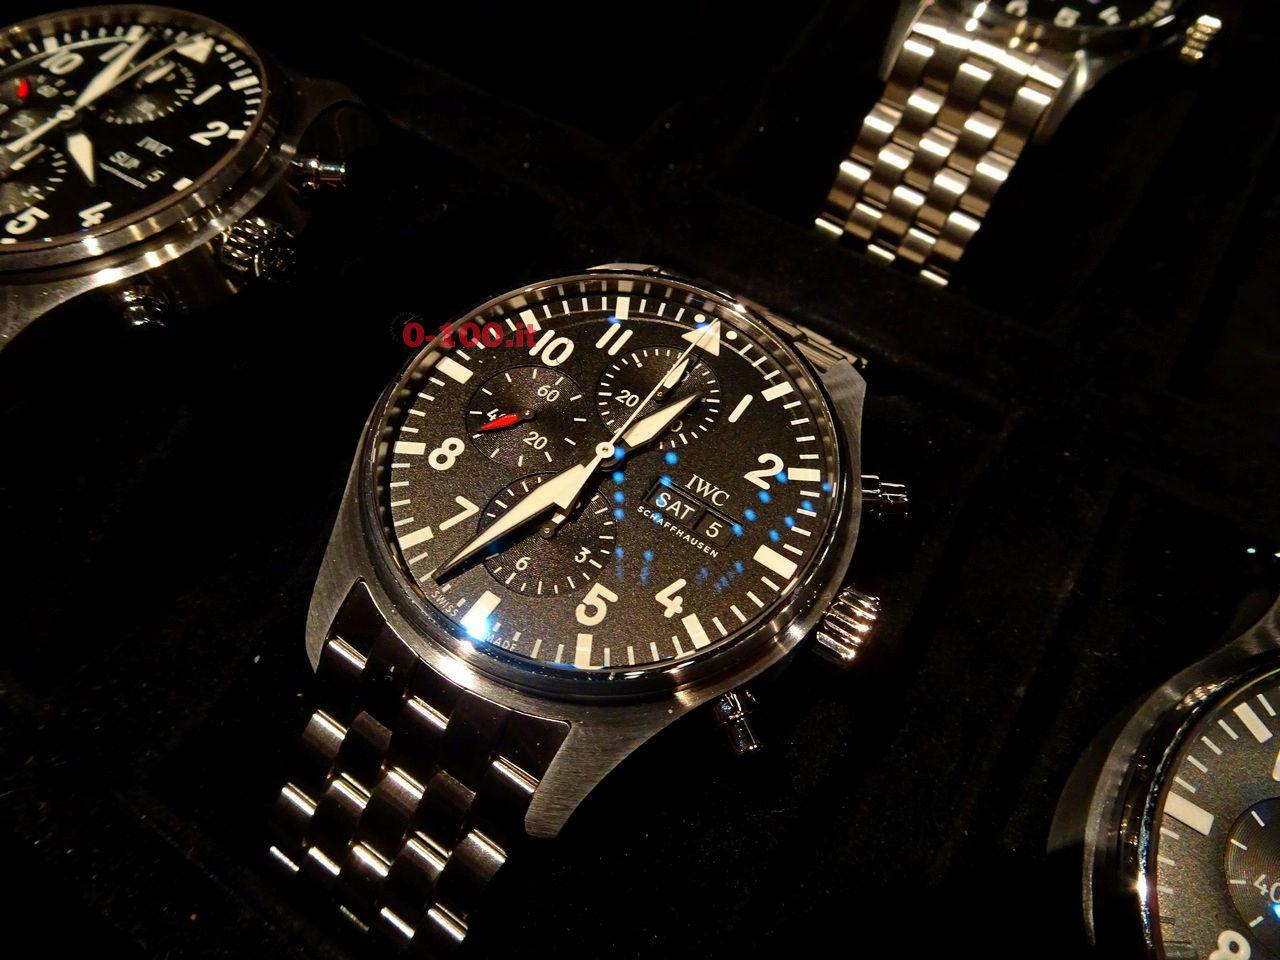 IWC-Pilot-Watch-Chronograph-ref-IW377709-IW377710-0-100_2